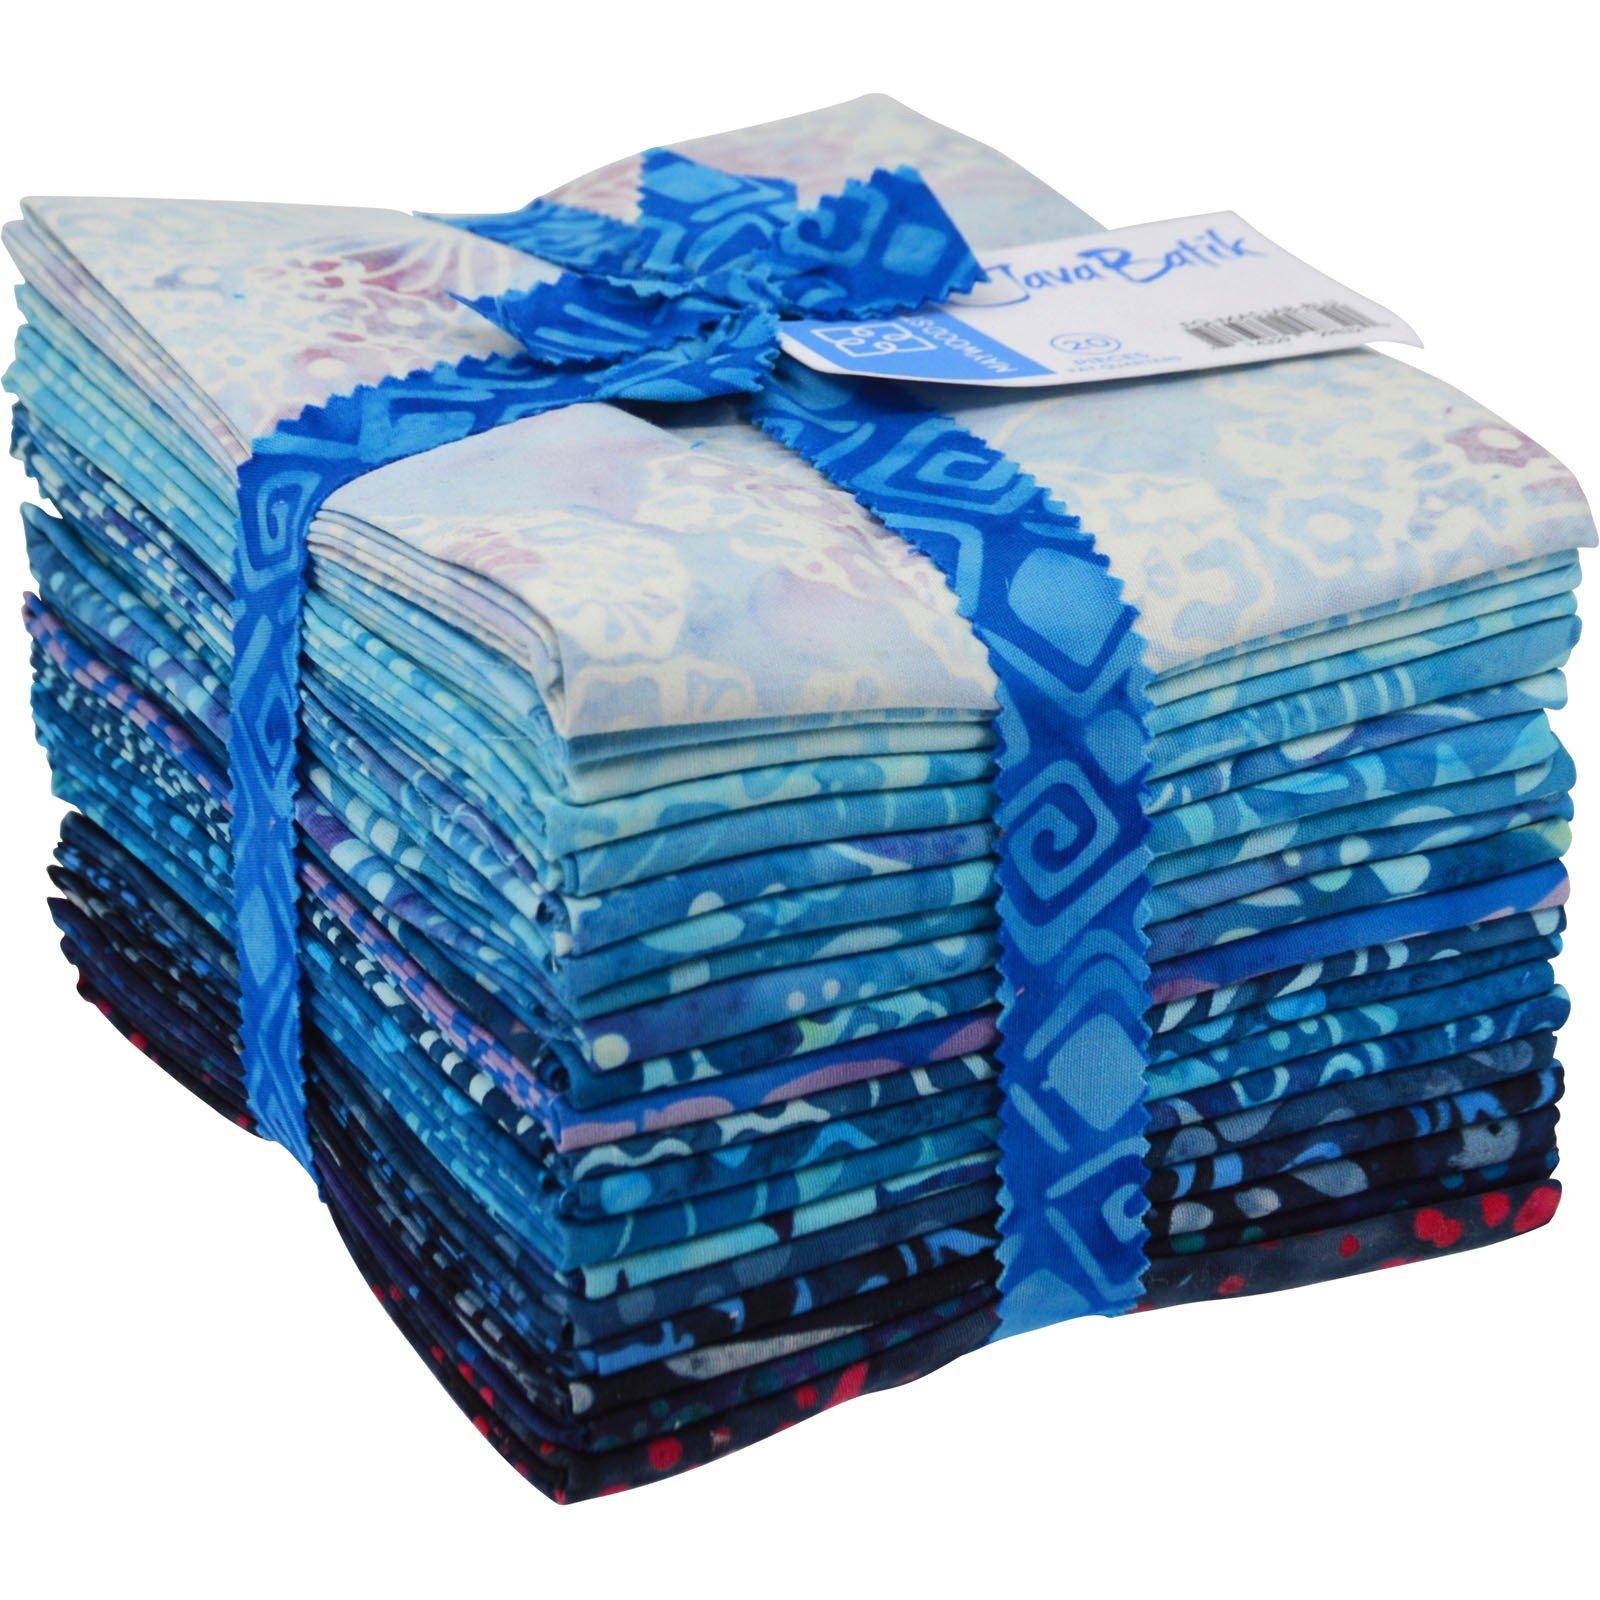 Maywood Java Batiks BLUE Print Bundles Fat Quarters (20)